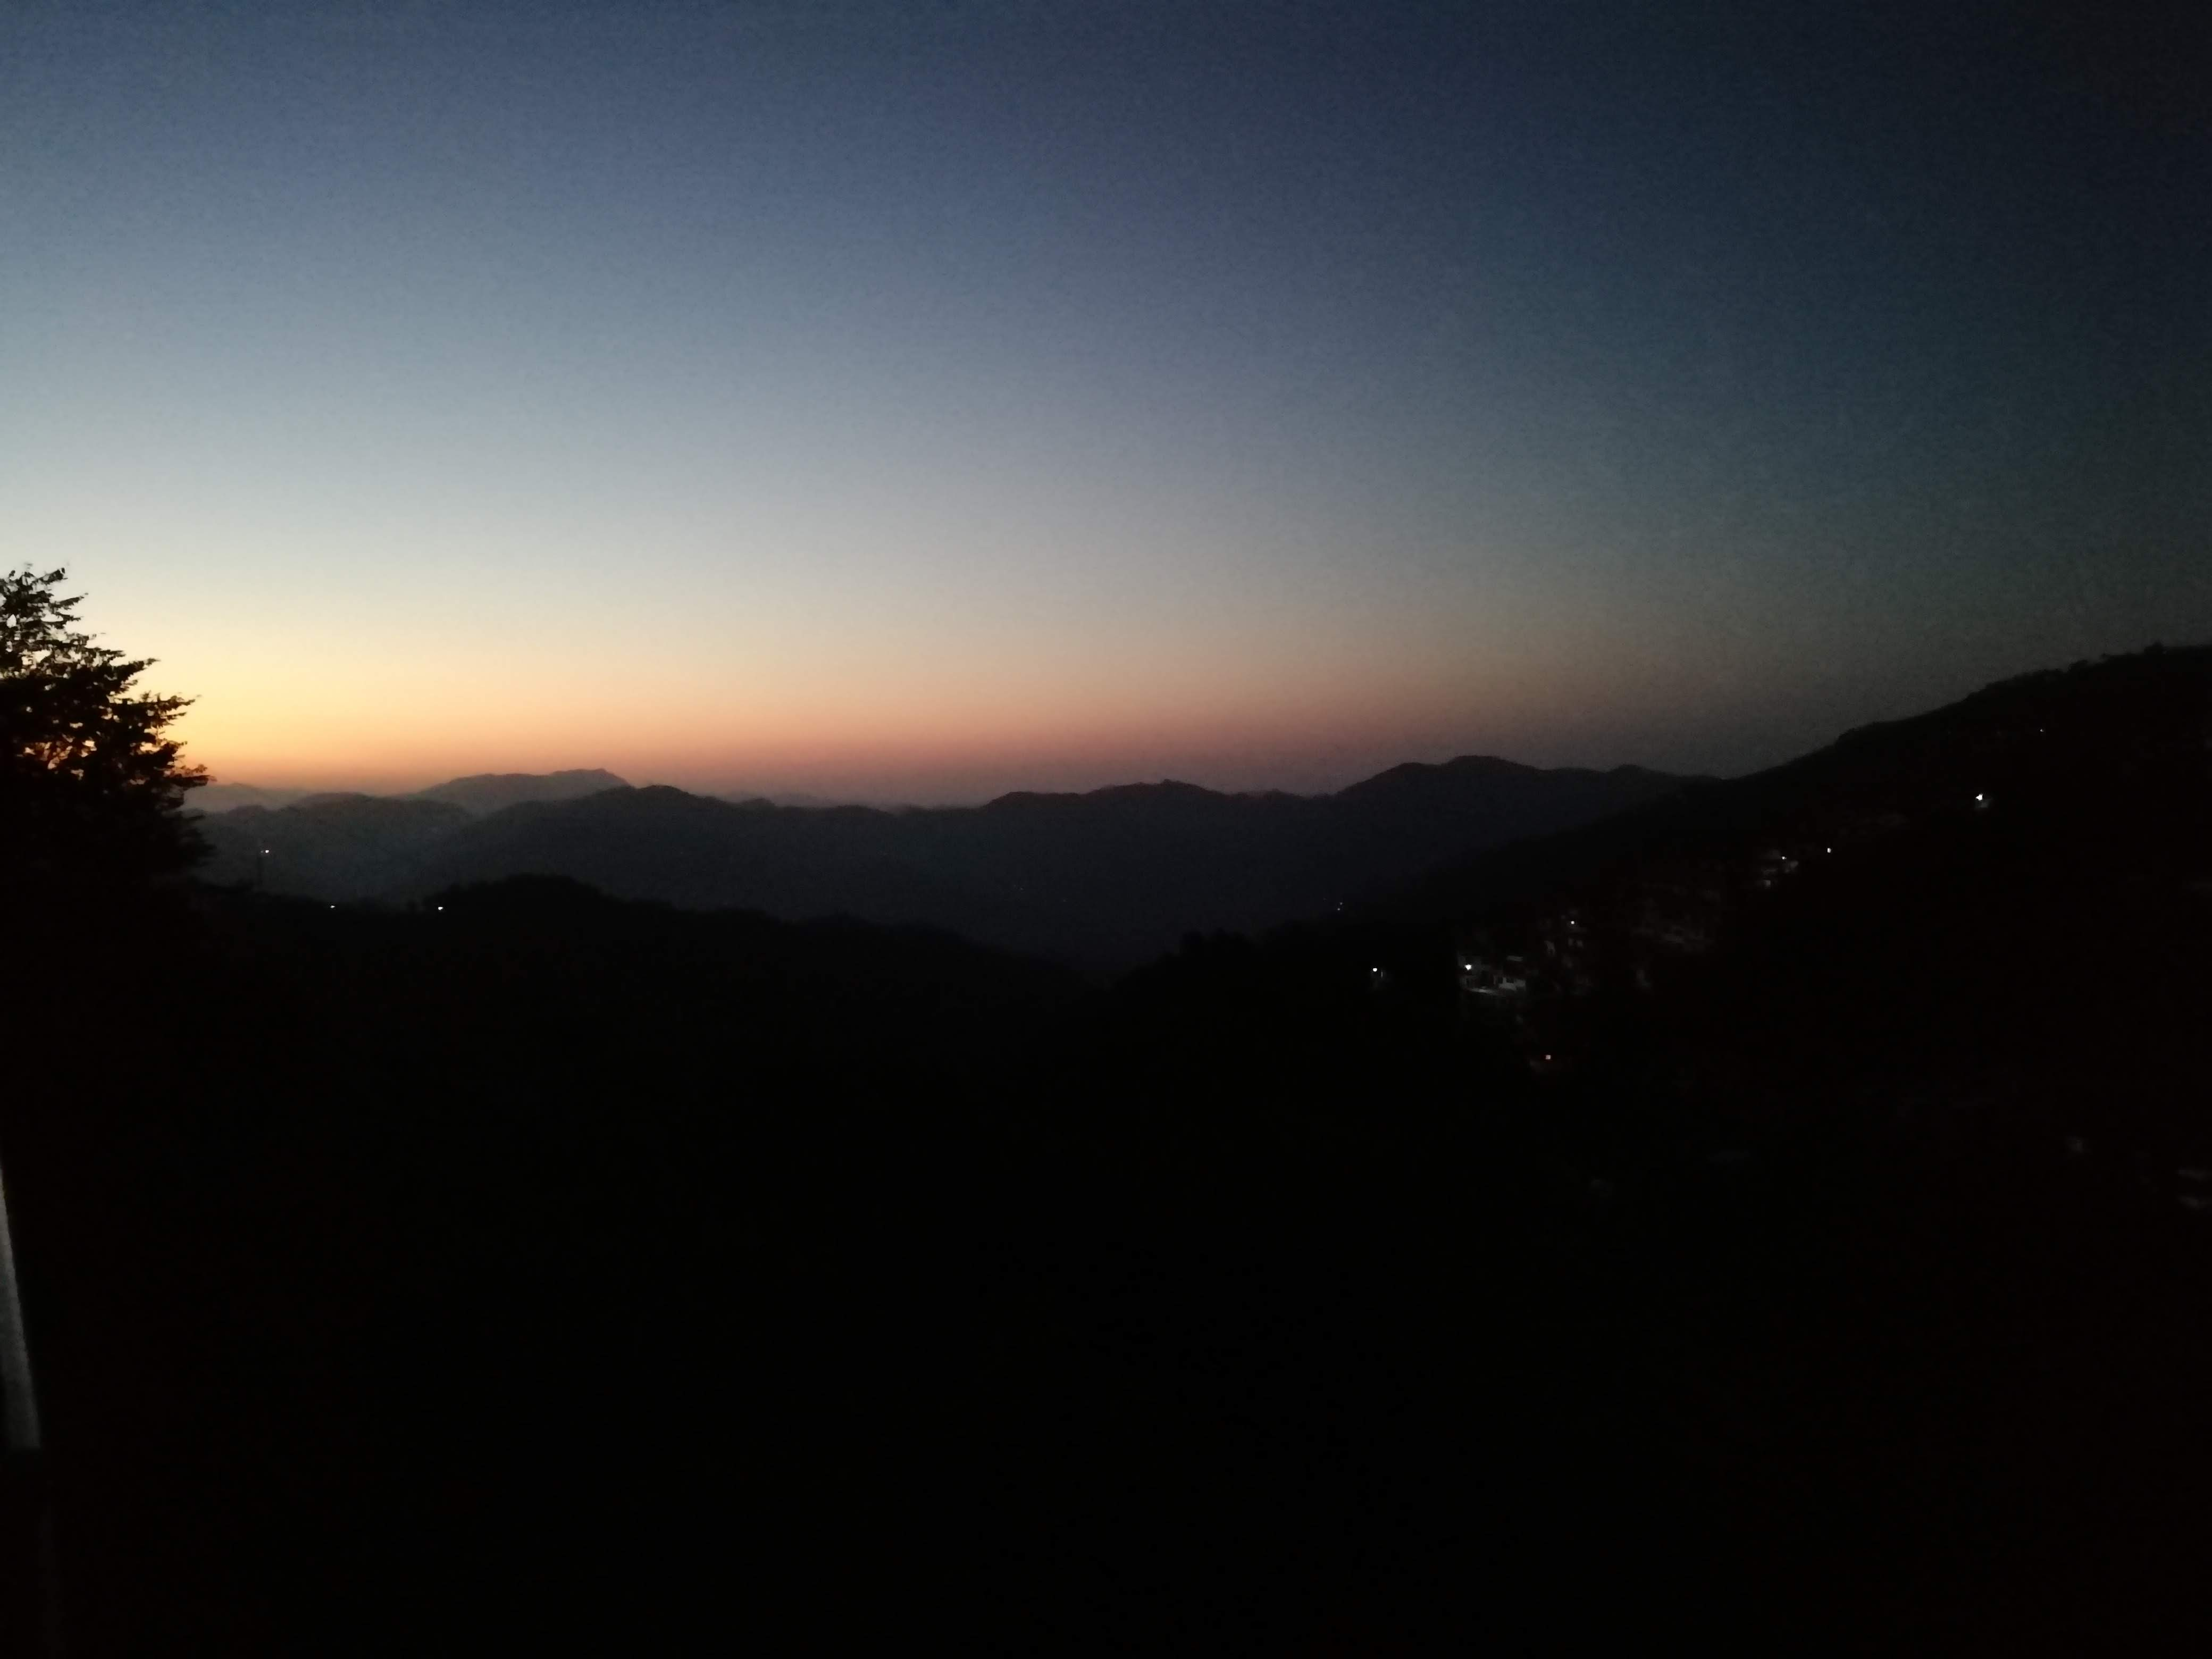 Pre-Sunrise View in Kasauli